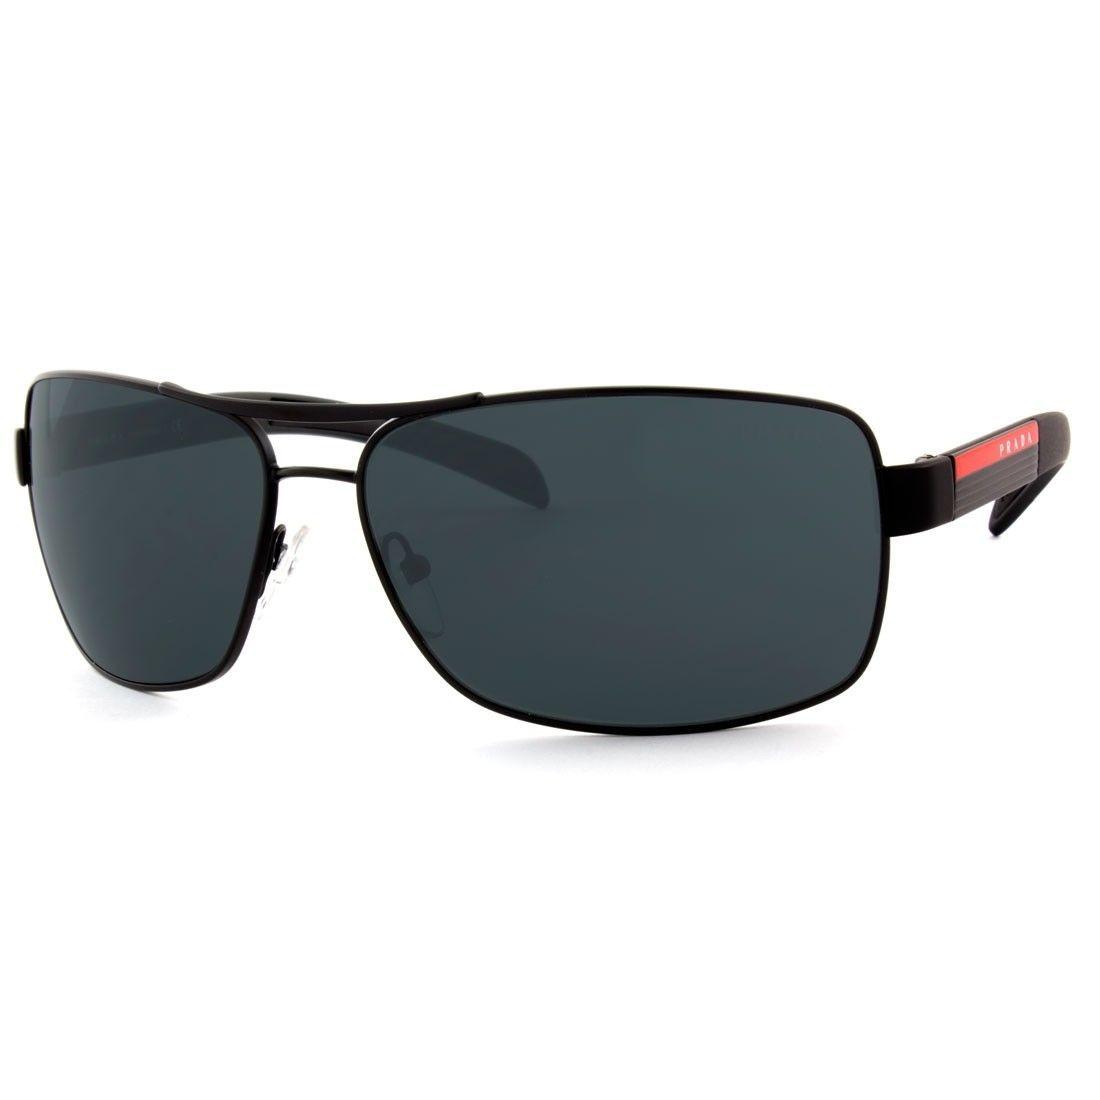 28b5ee60fc Raro Prada Sps 54I 1BO-1A1 Gafas de Sol and 27 similar items